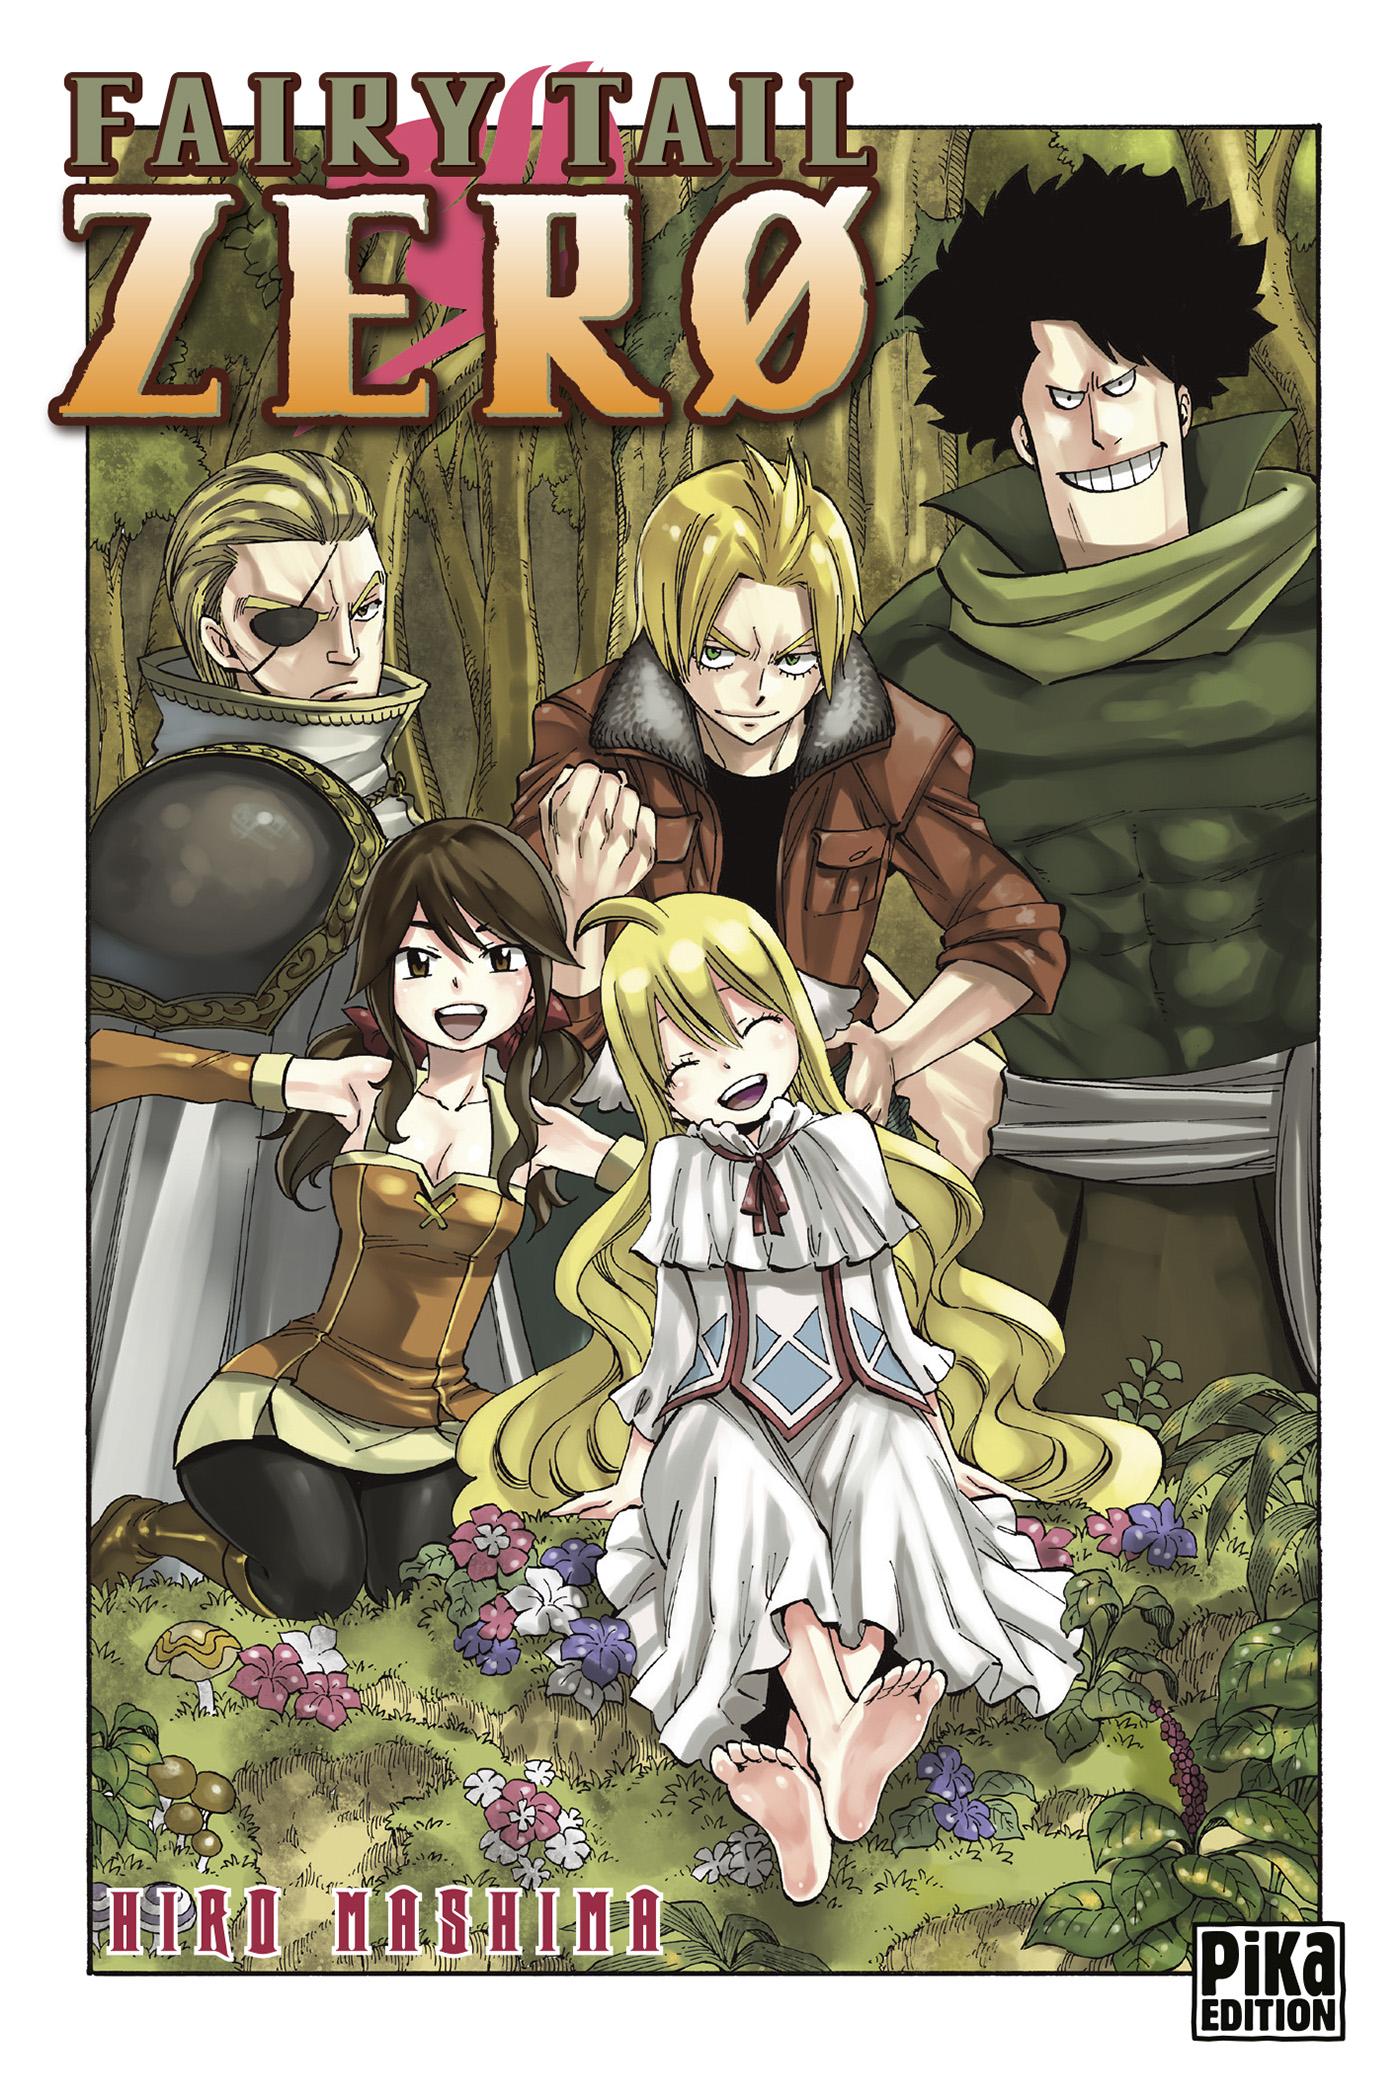 Fairy_Tail_Zero_JKT_9782811631000.indd